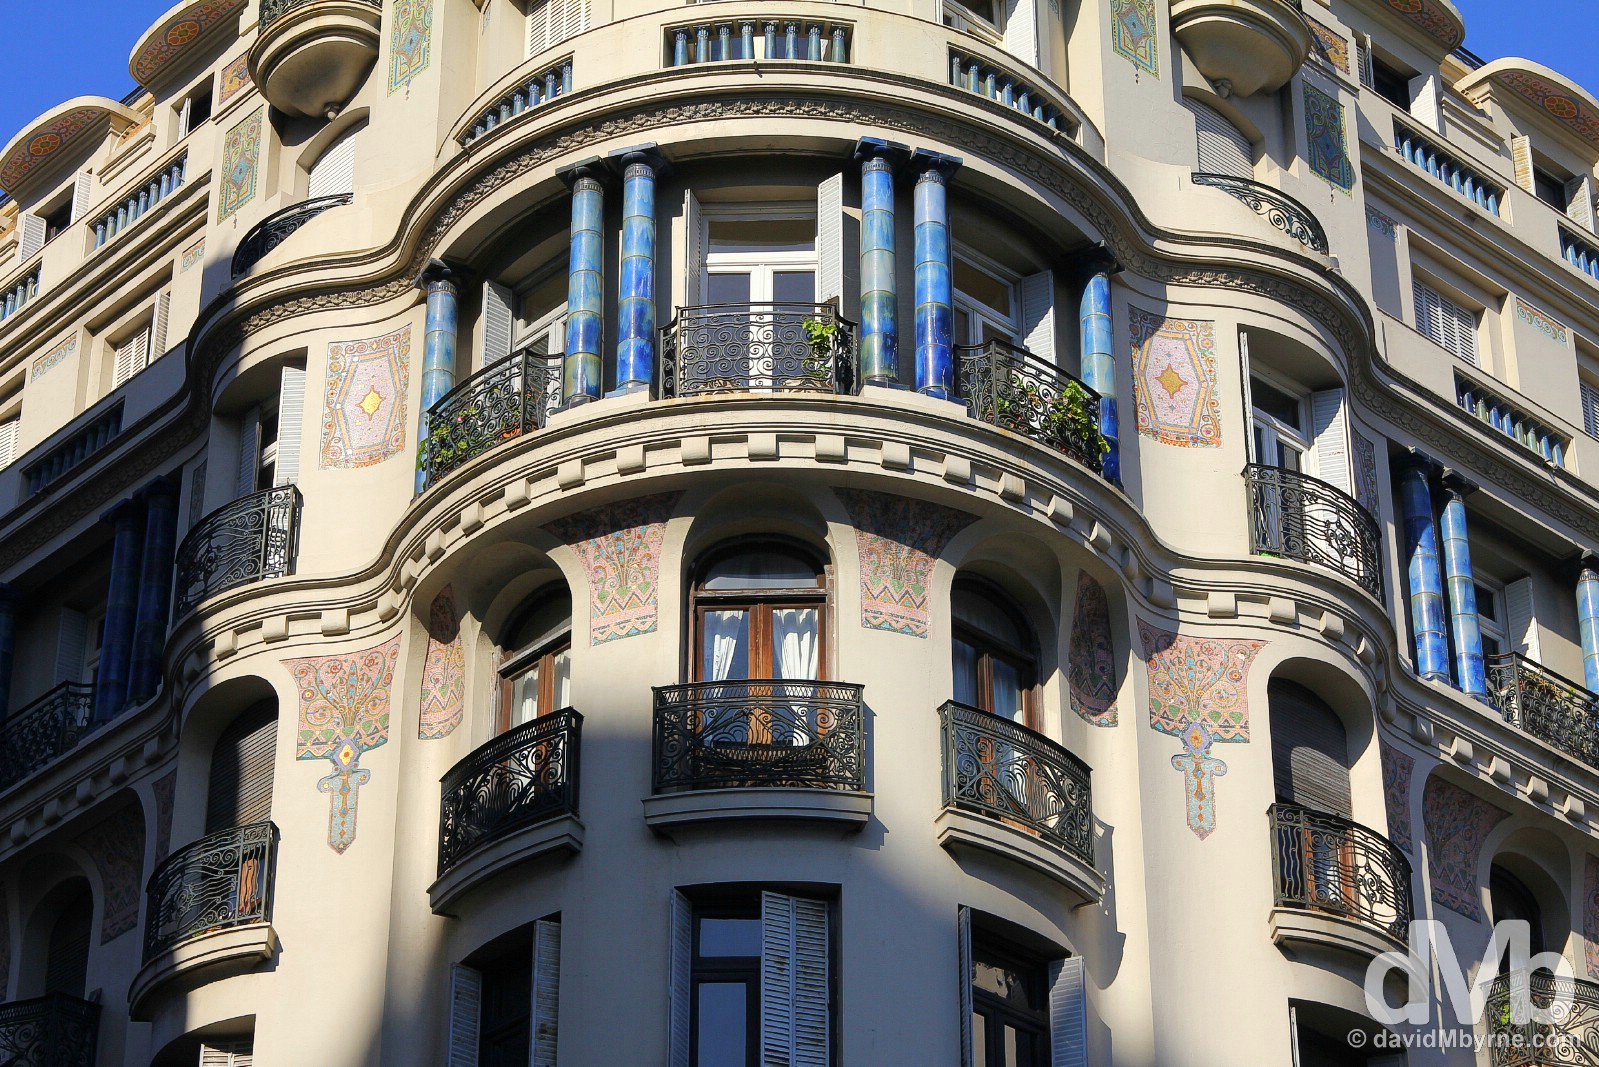 A building in Montevideo, Uruguay. September 18, 2015.